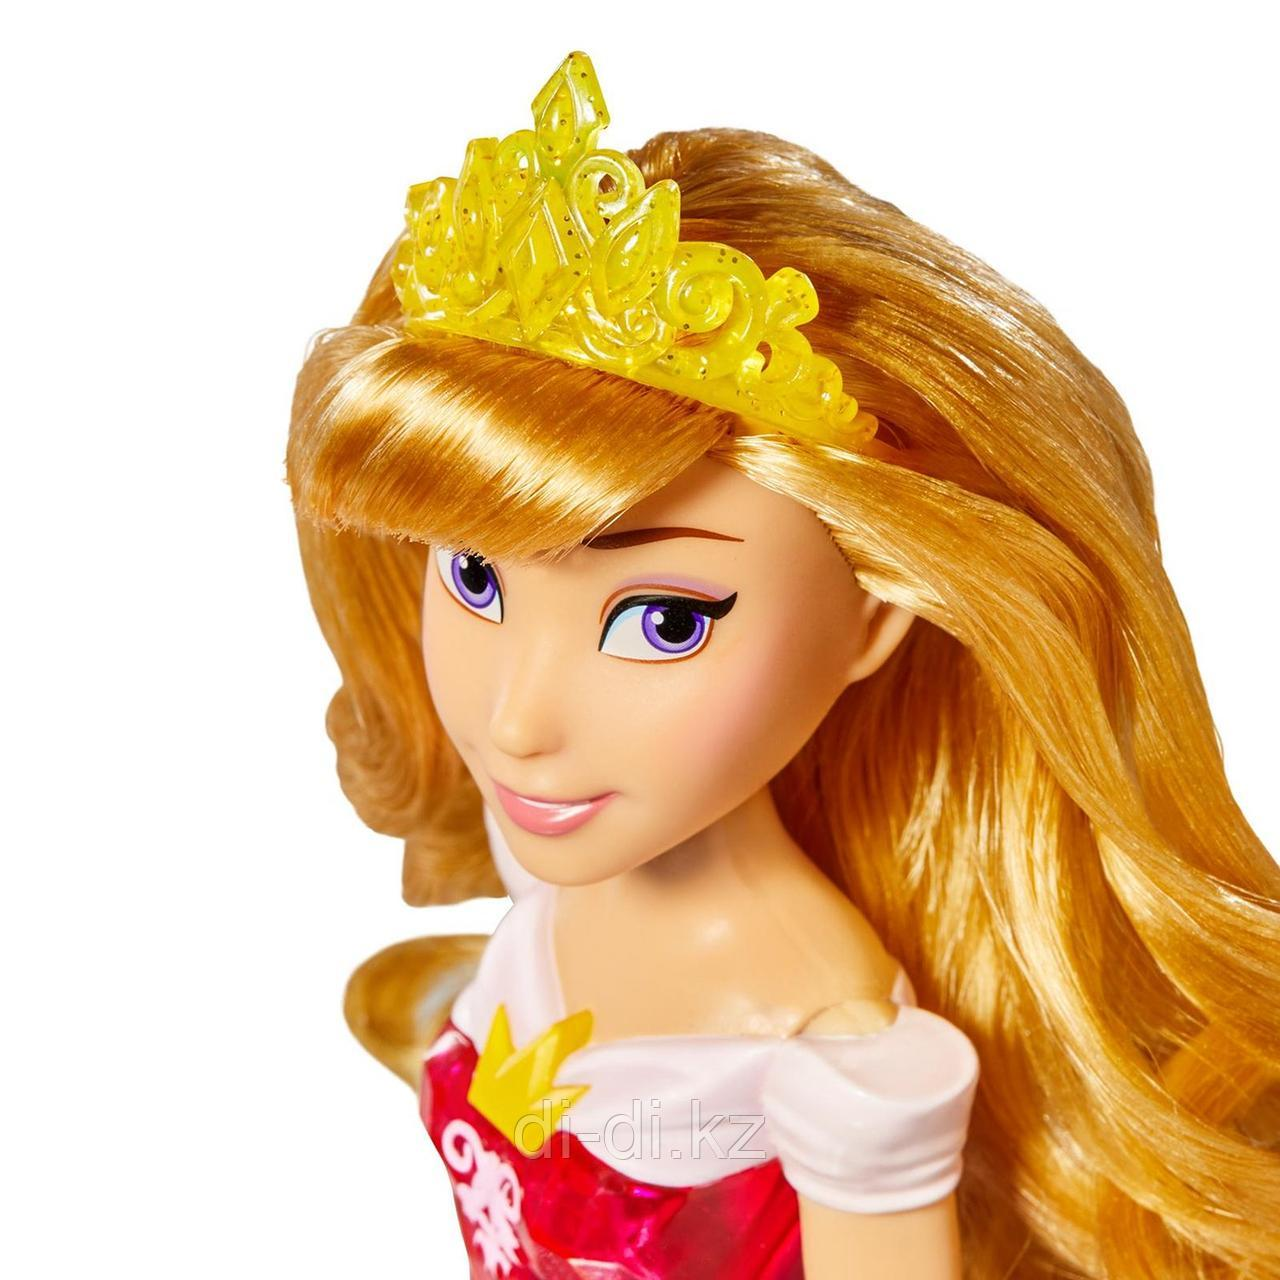 Hasbro Disney Princess Кукла Аврора F0899 - фото 4